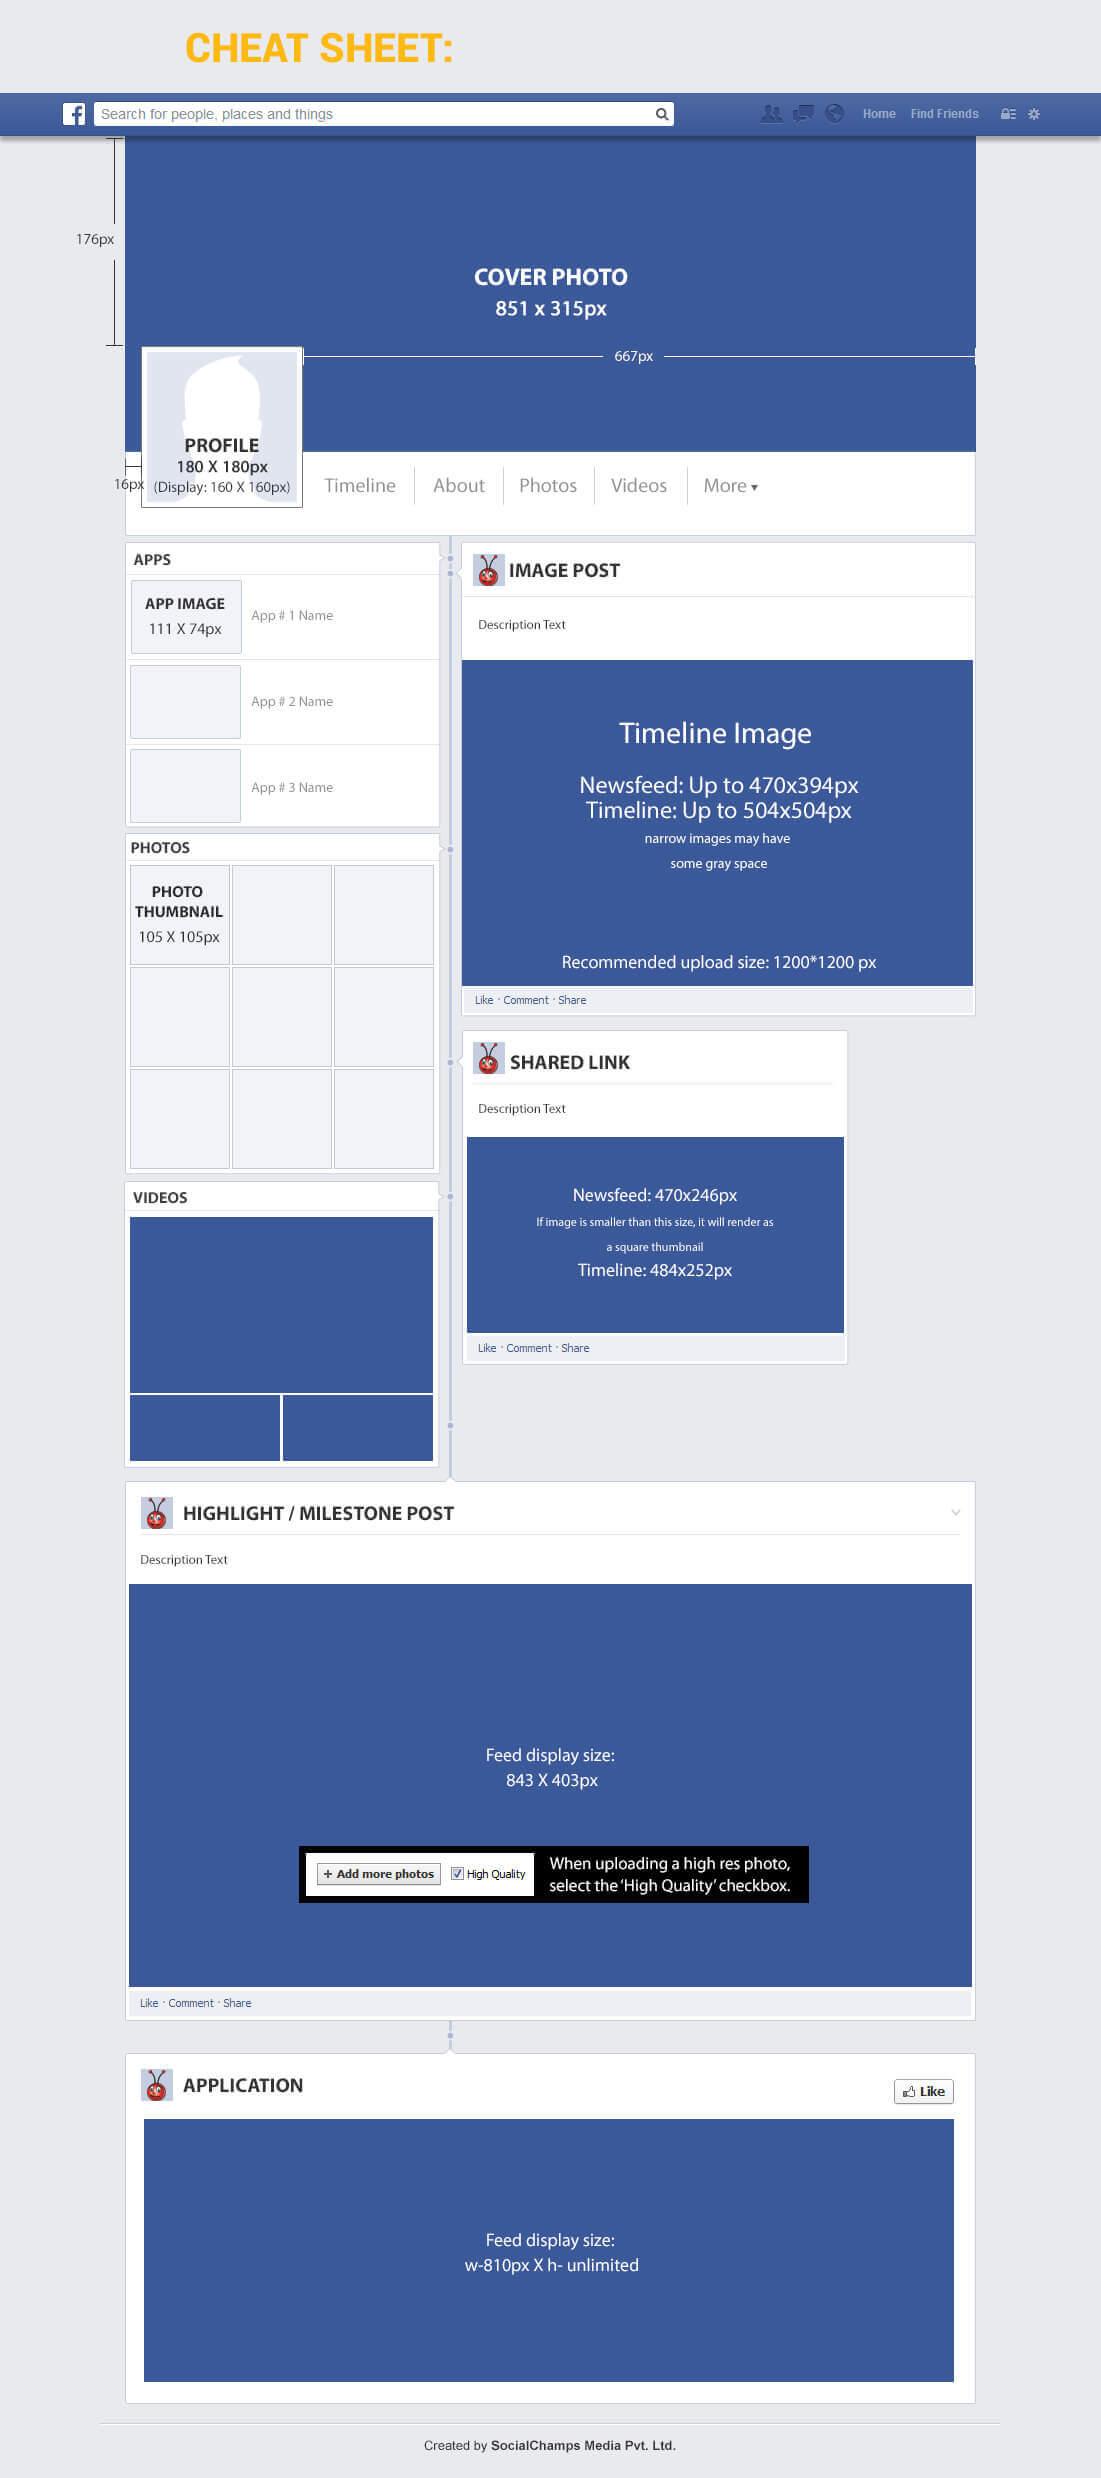 FB-Regular-dimensions-infographics